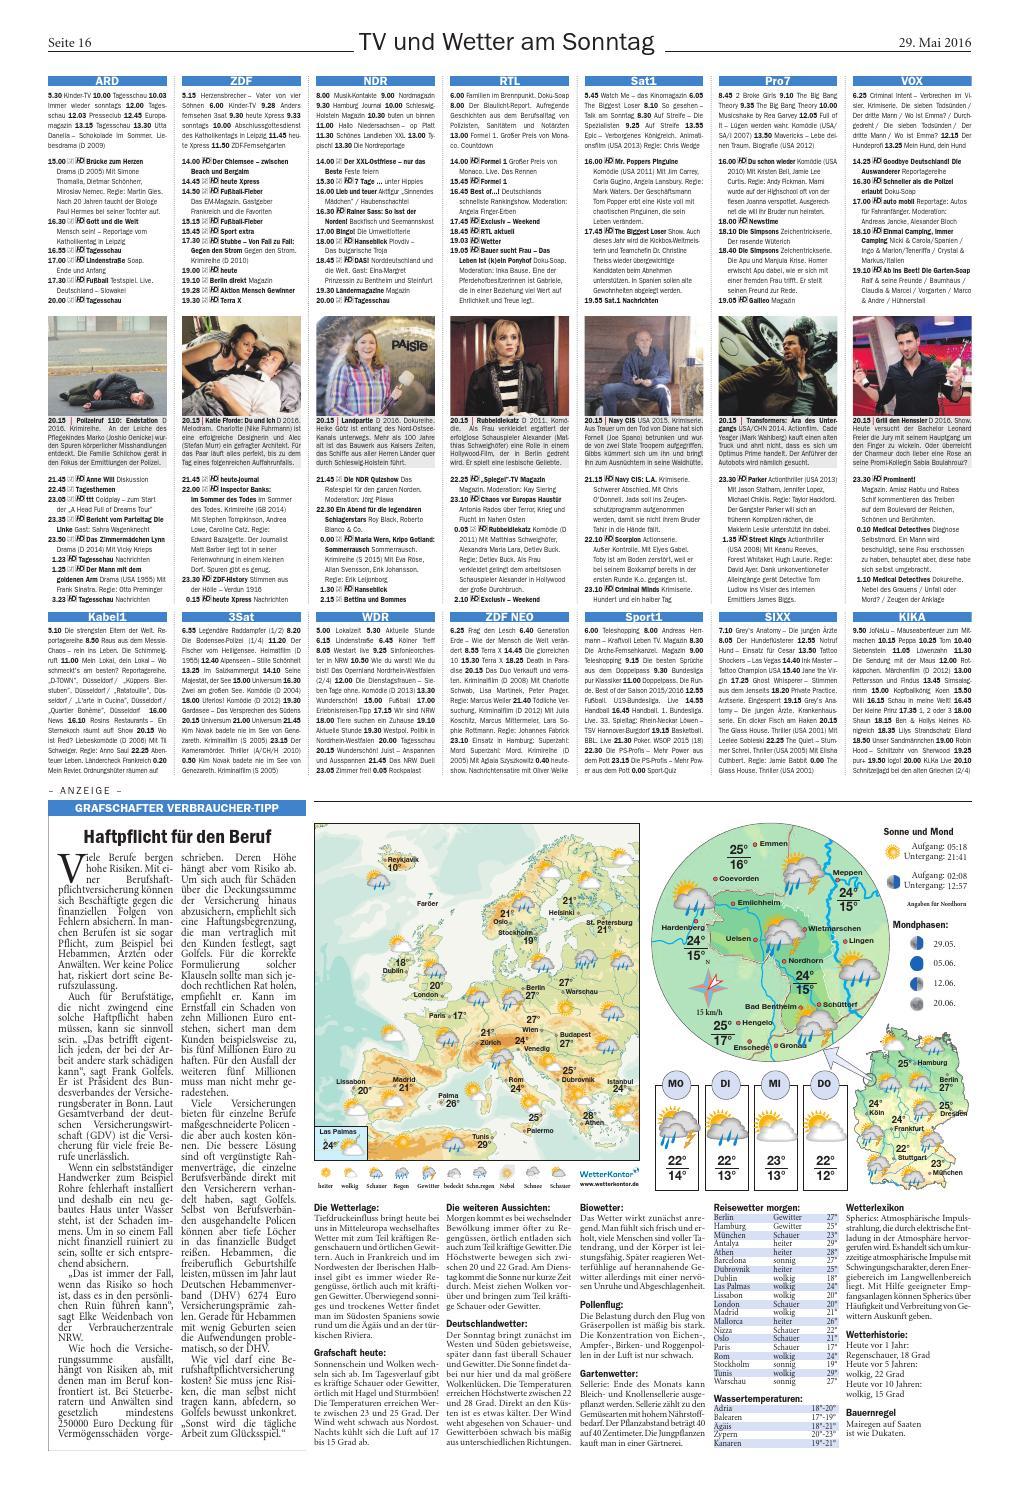 Sonntagszeitung_29.5.2016 by SonntagsZeitung - issuu